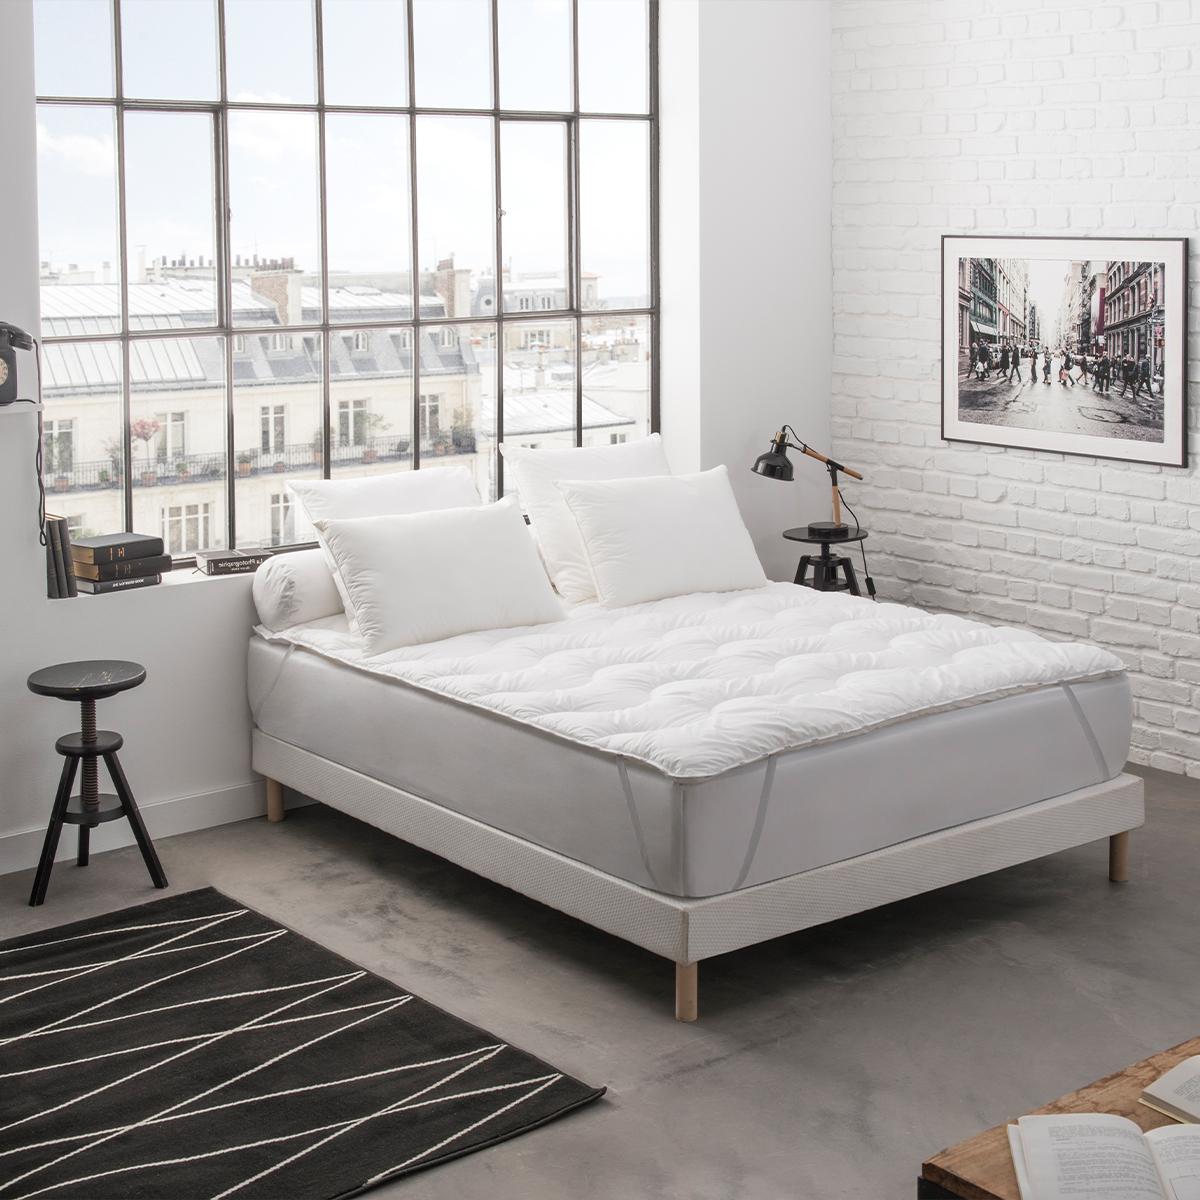 Surmatelas Surconfort® Ultra Confort 160x200 cm